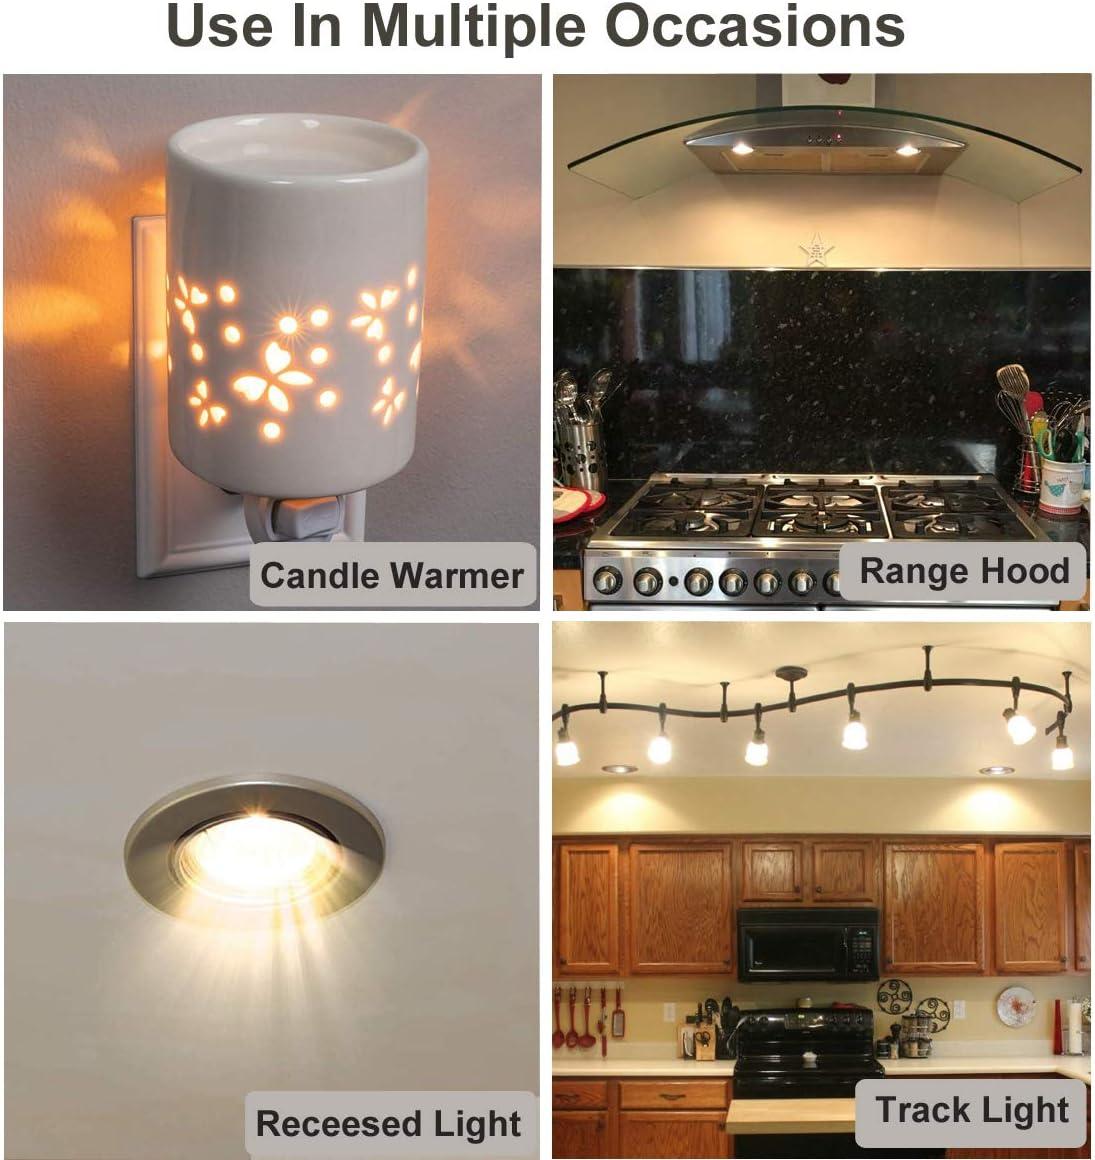 Vinaco Candle Warmer Light Bulbs Tart Burner gu10 Base Warm White Track Lighting gu10+c